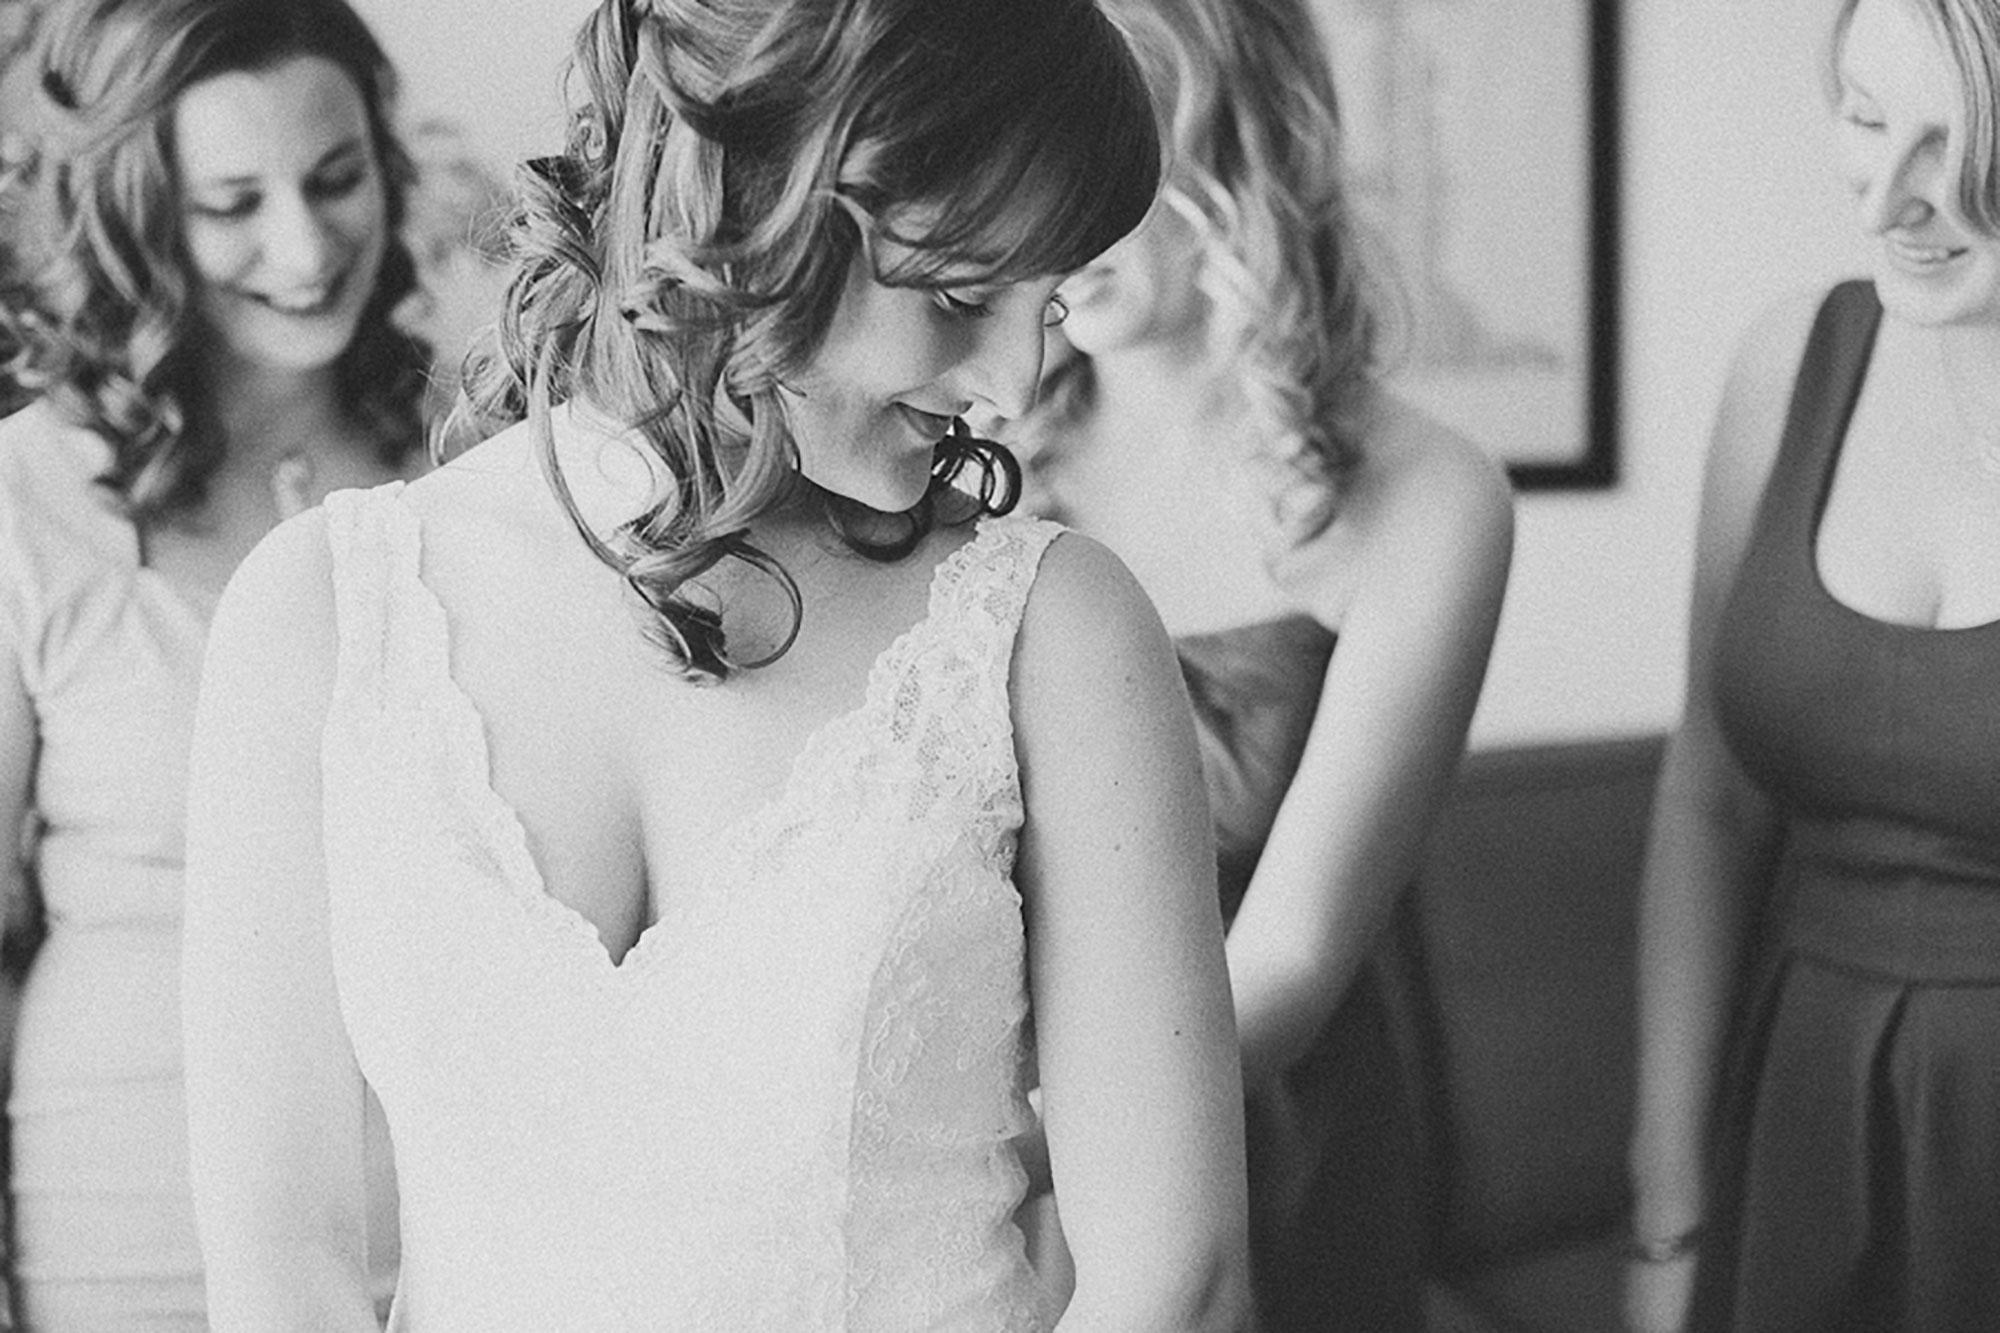 Navy-Hall-Wedding-Vineyard-Bride-Photo-By-Andrew-Mark-Photography-003.jpg